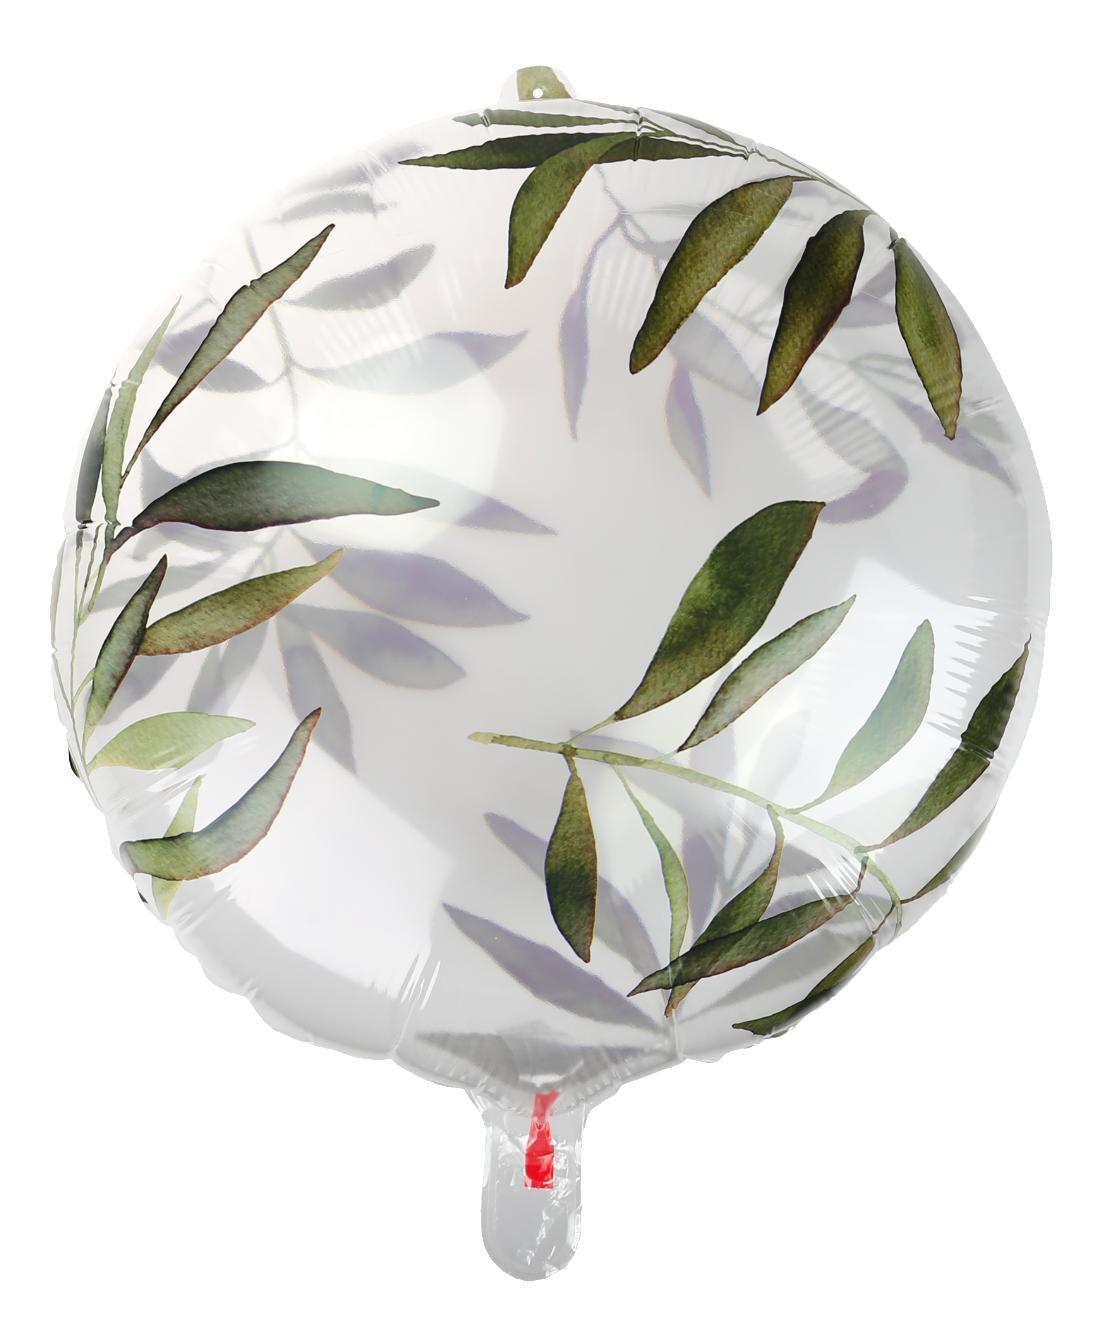 HEMA Folie Ballon 50 Cm - Bladeren